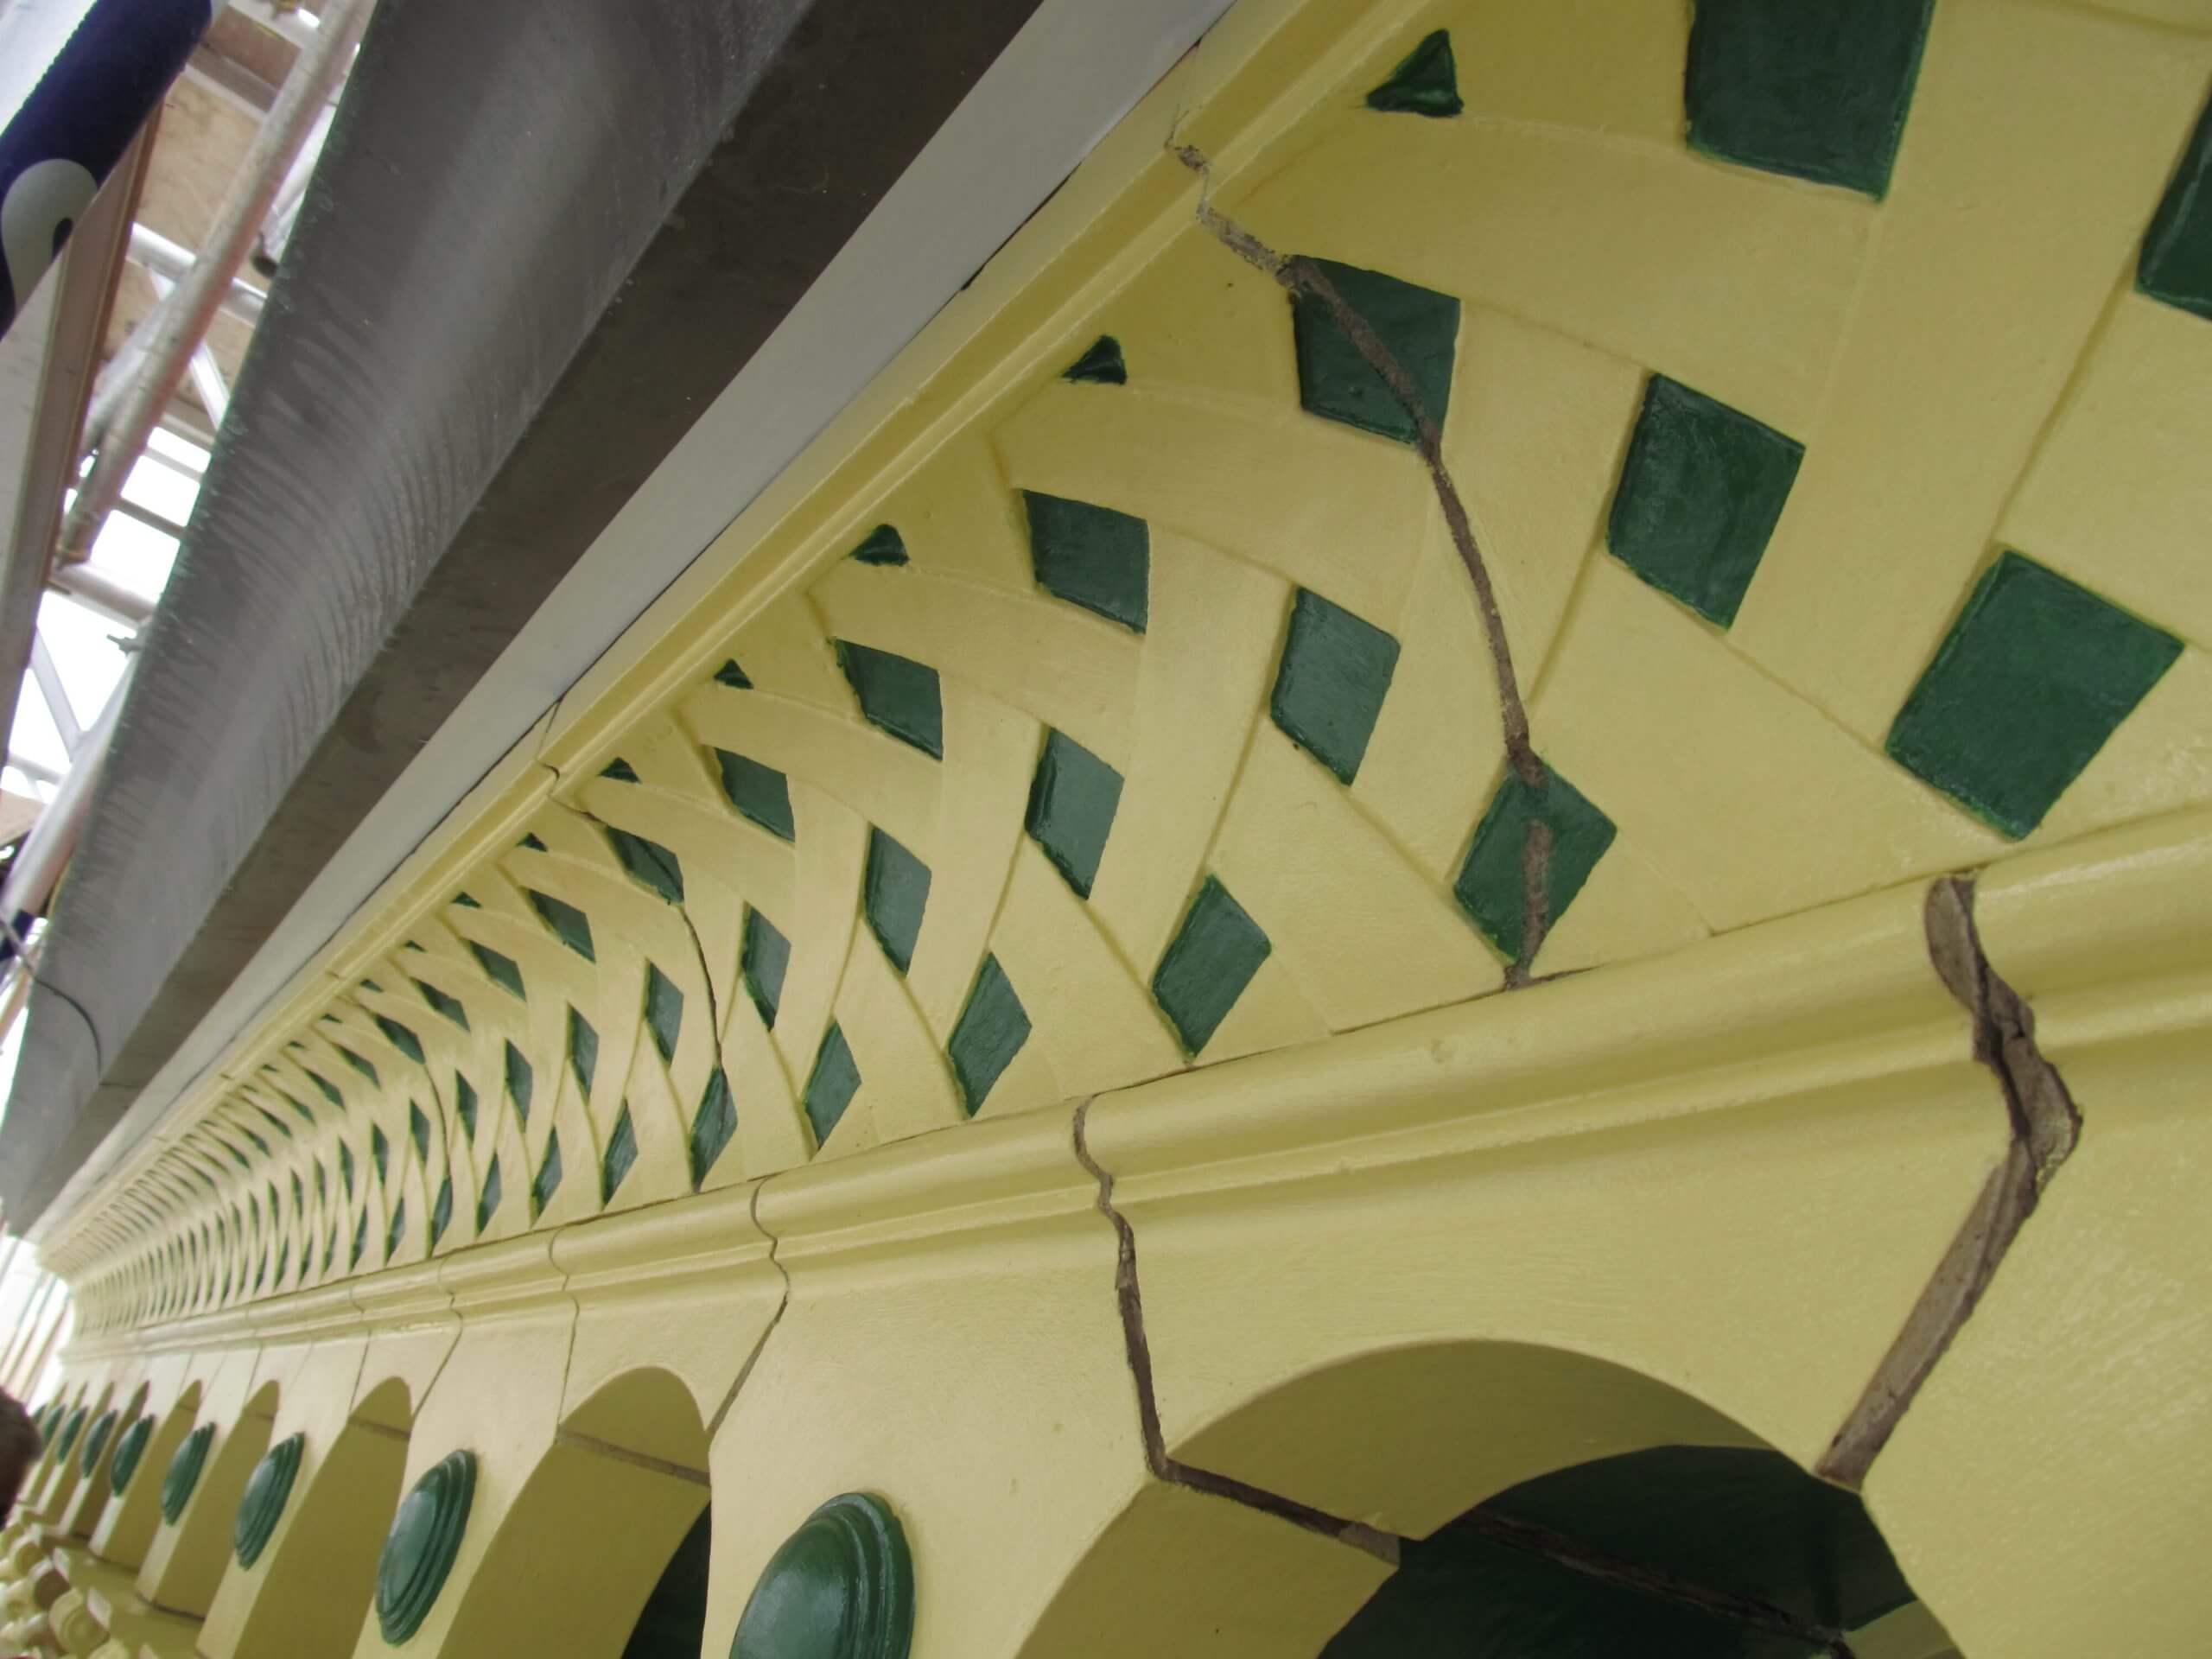 Heritage Work Façade Upgrade - Building Maintenance - Remedial Building Services